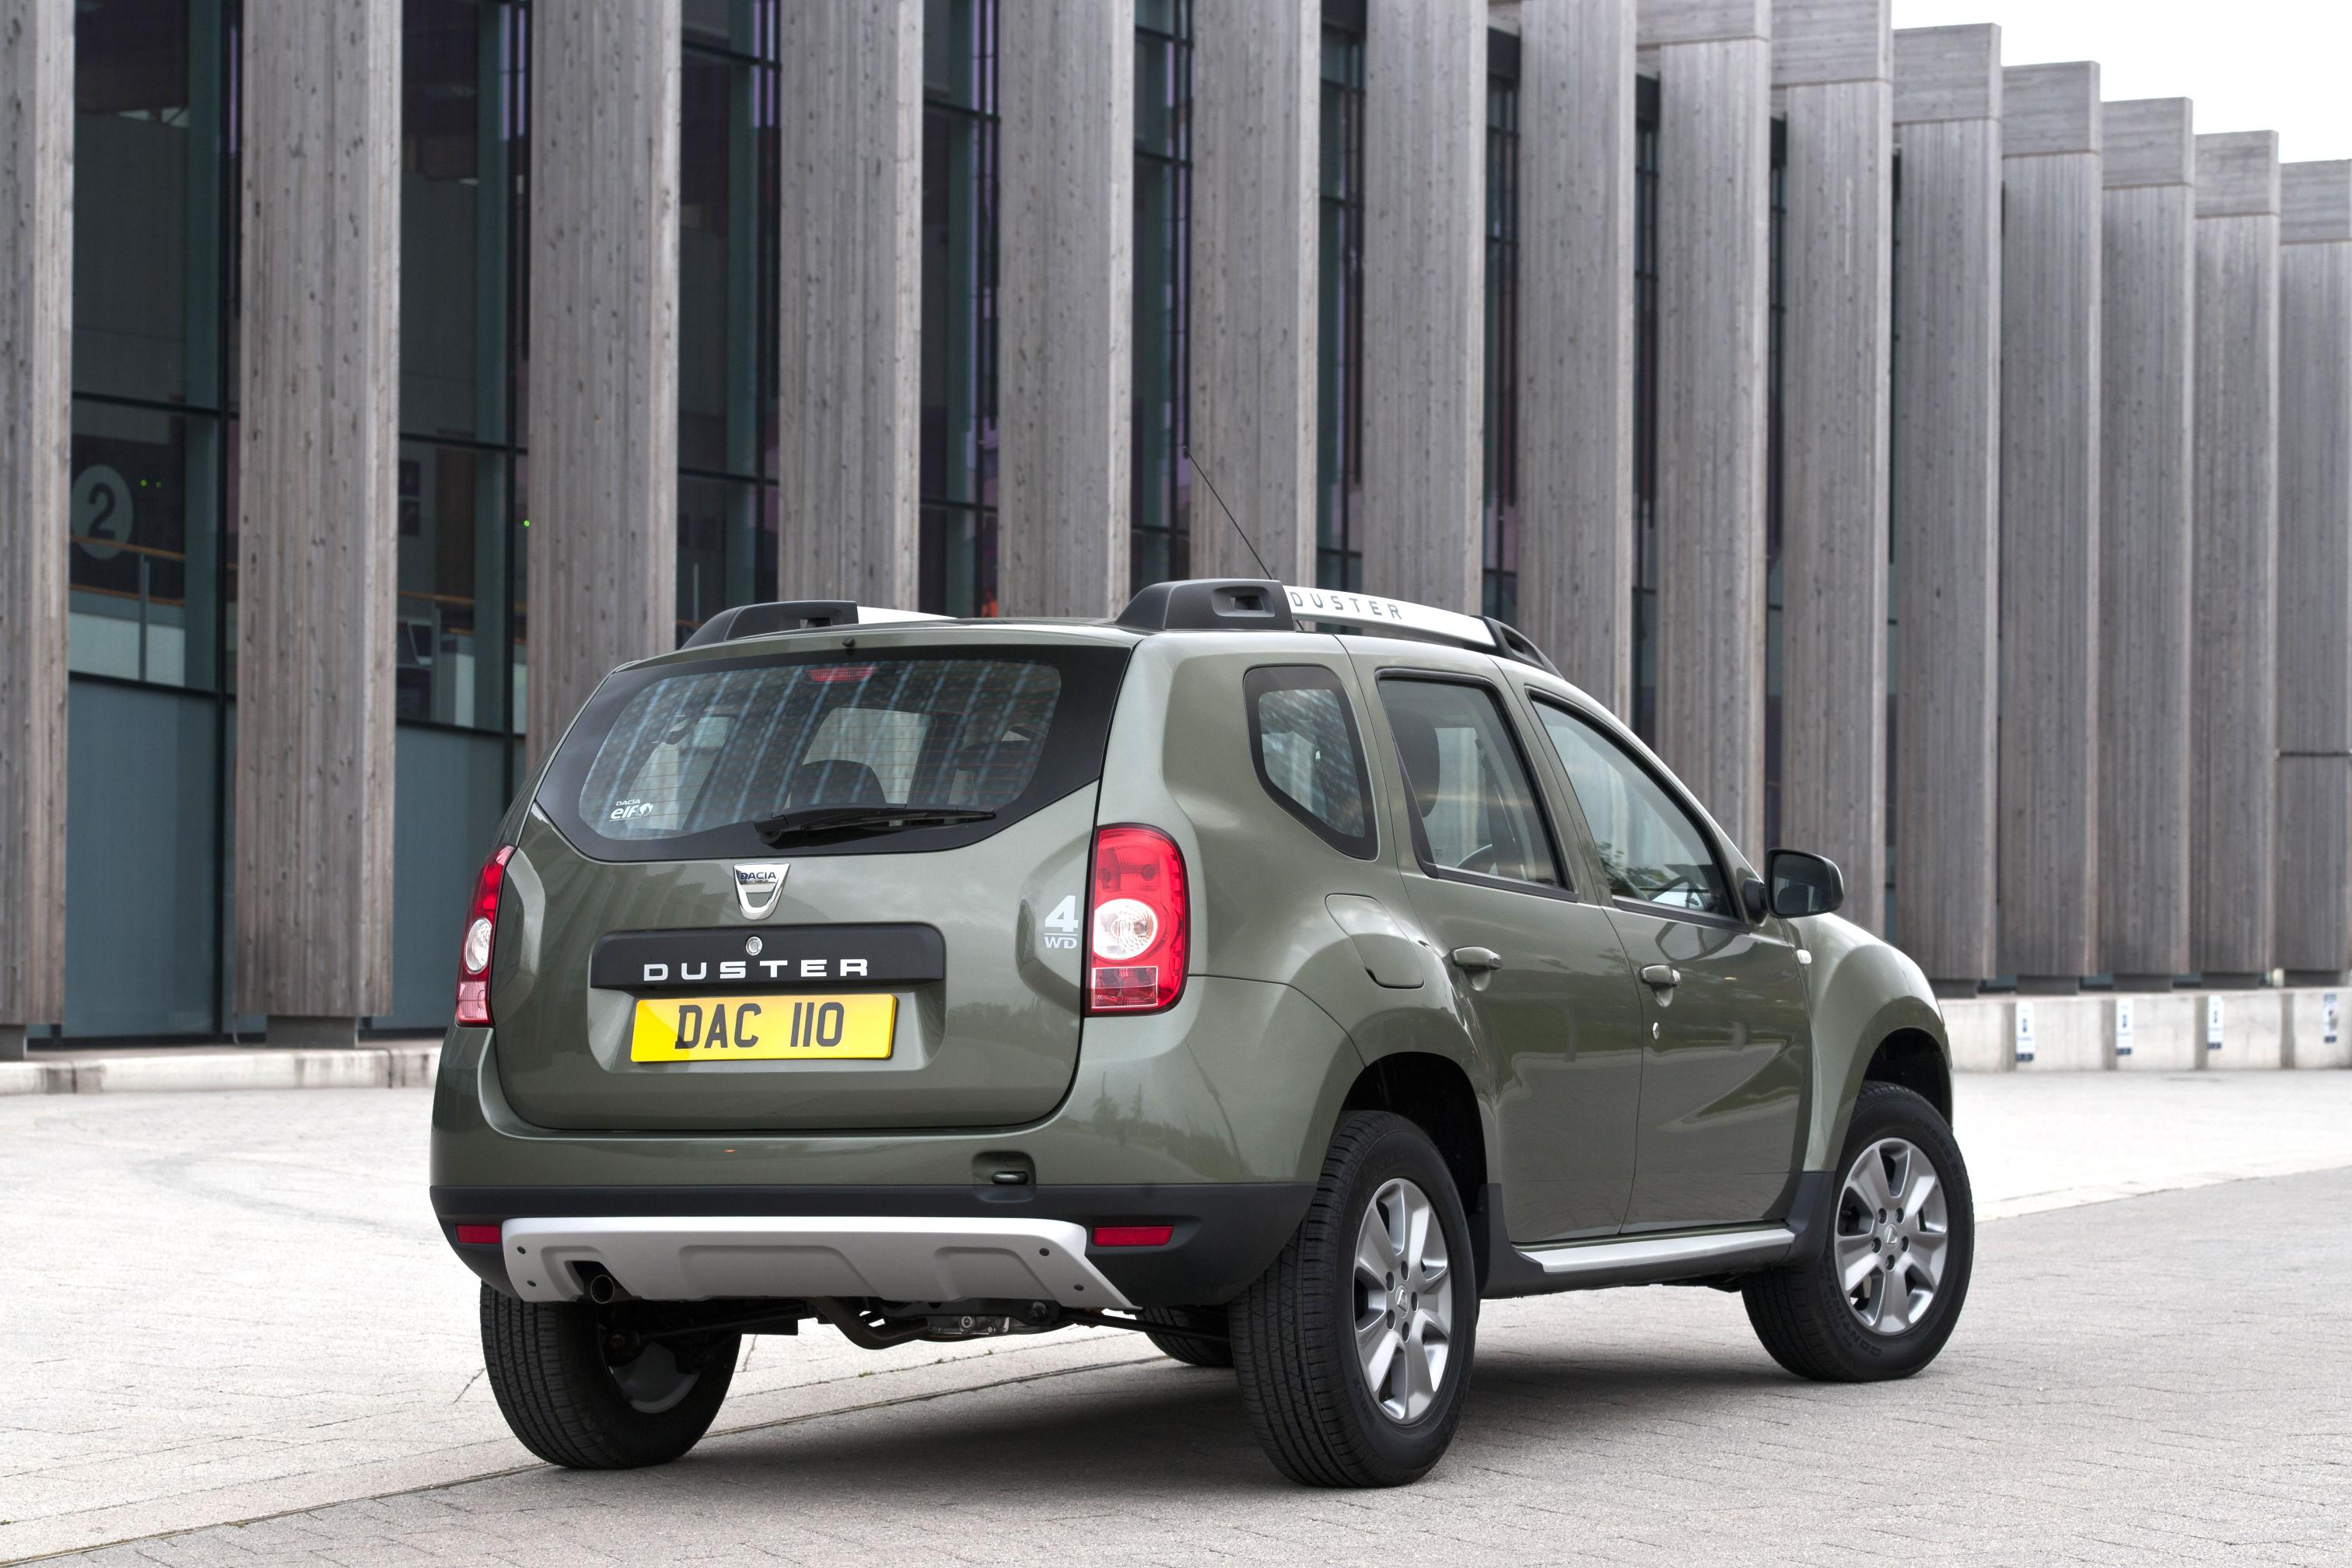 2015 Dacia Duster Facelift For Uk Market Unveiled Autoevolution